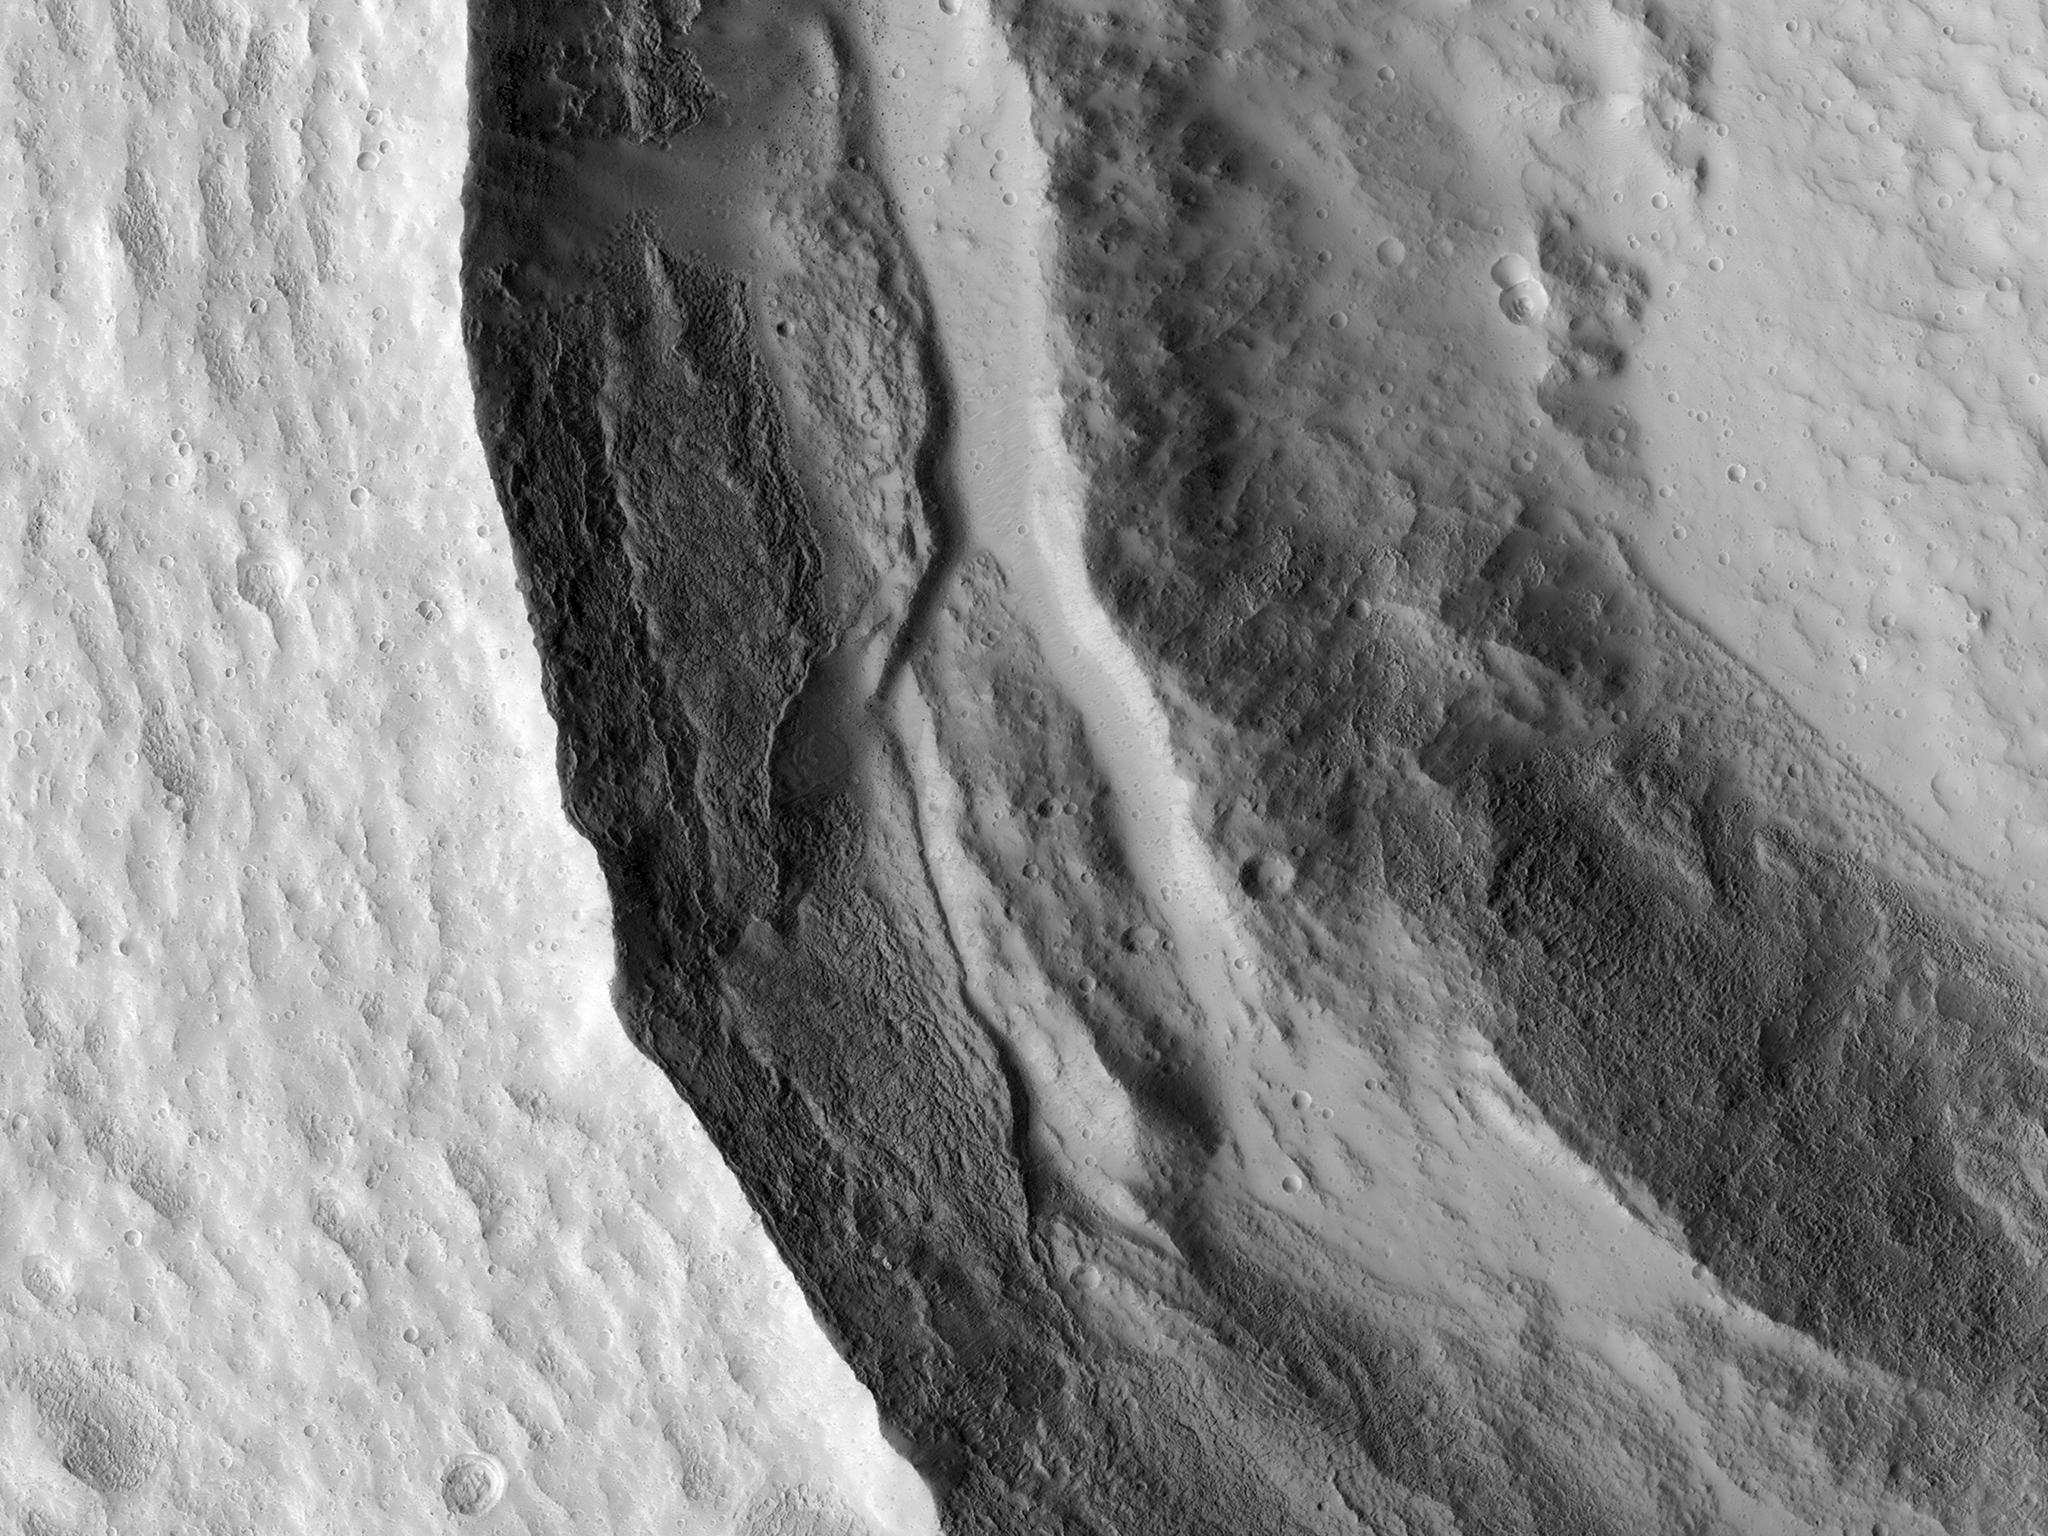 Slumping Terraces On A Crater Wall (ESP_035702_2270